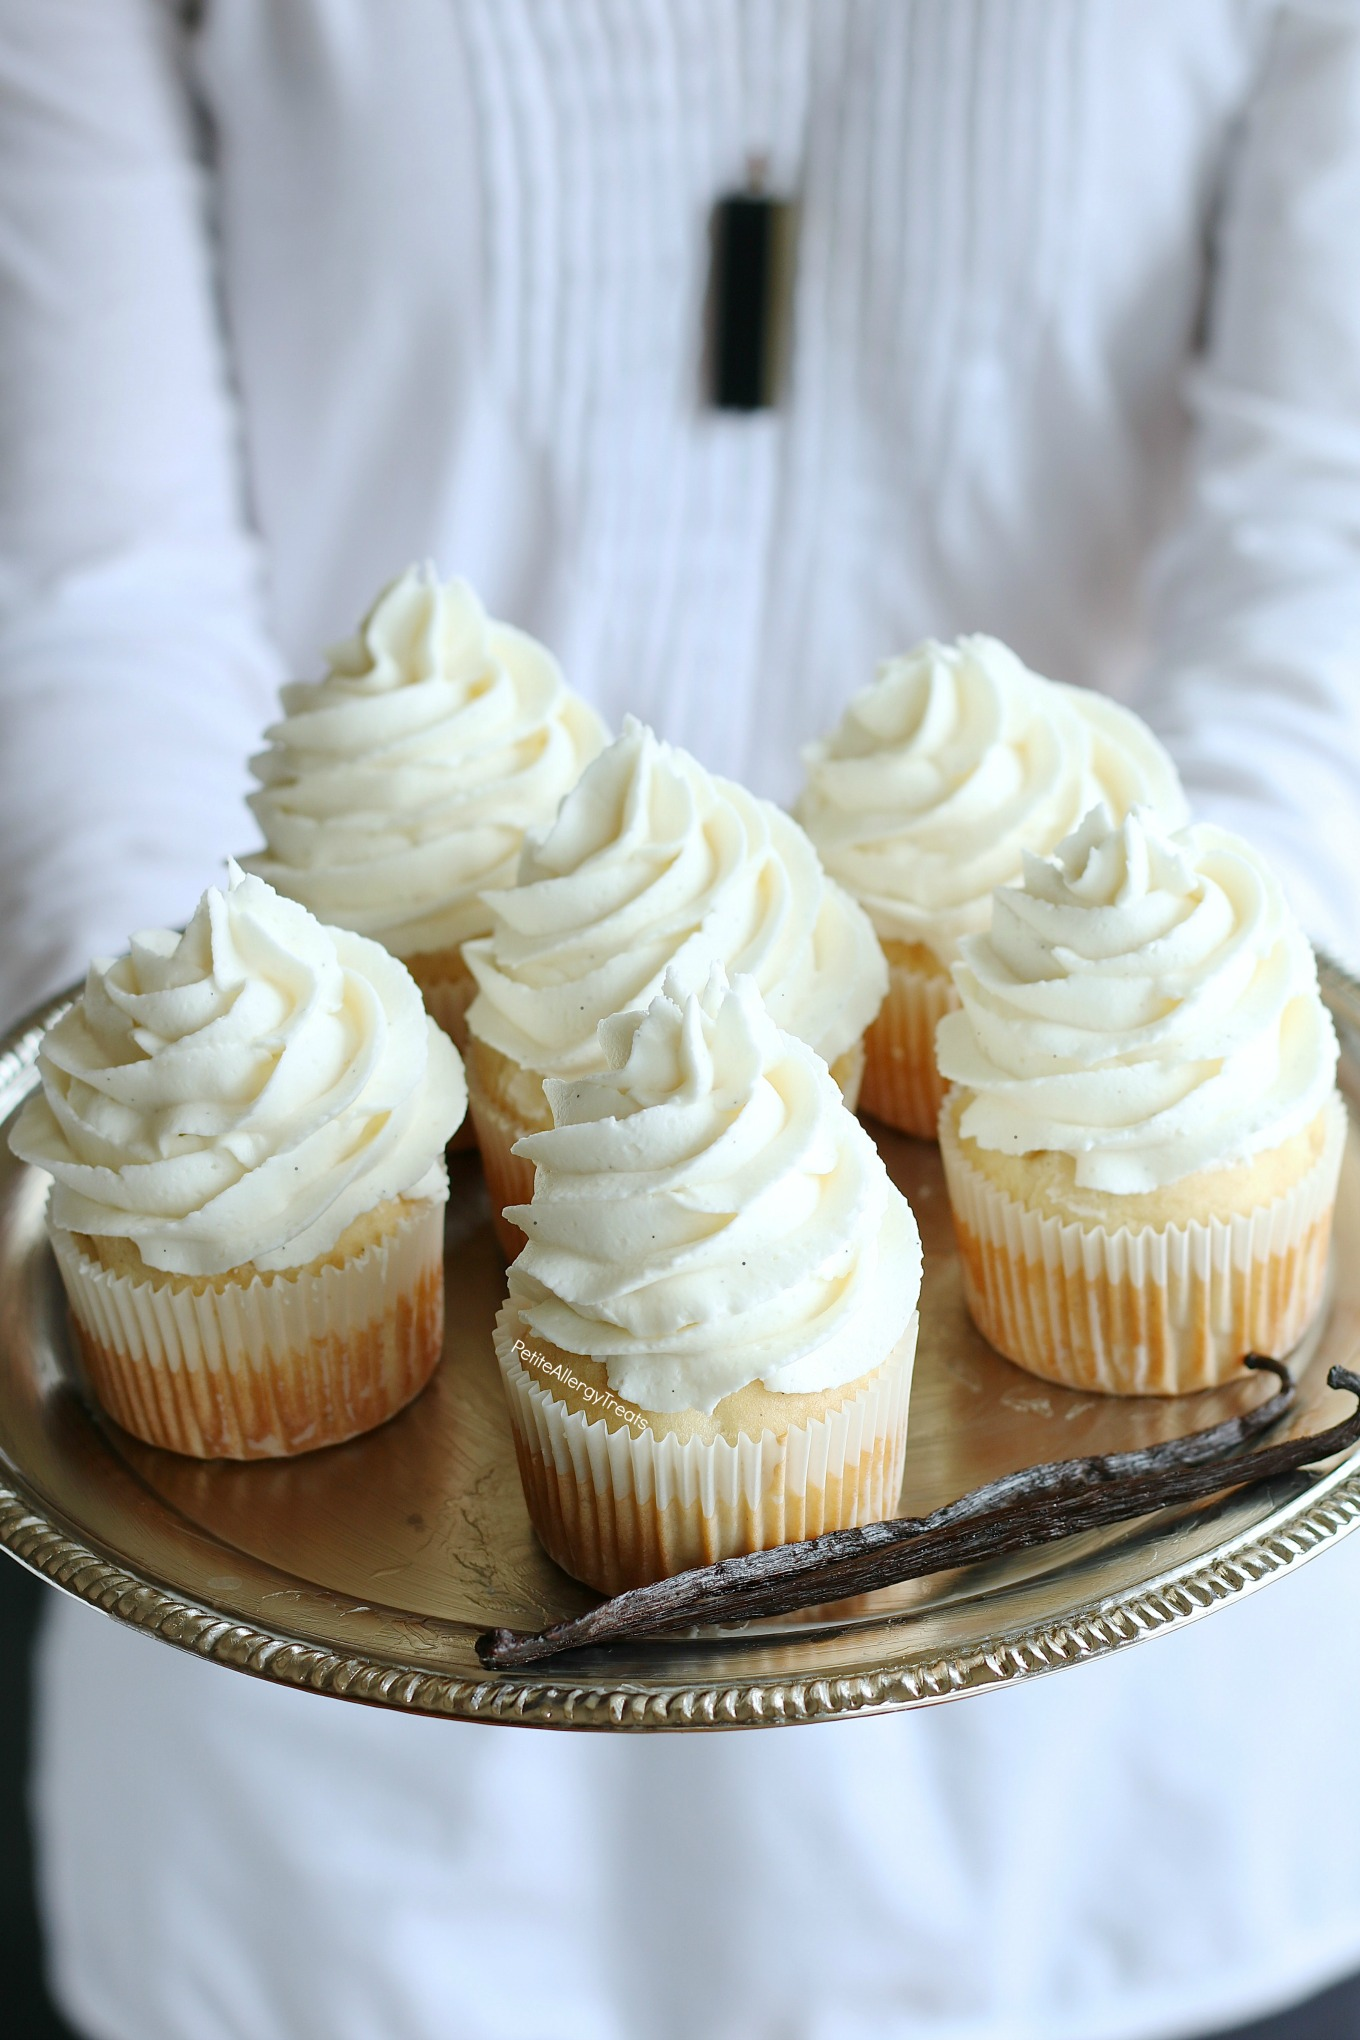 Gluten Free Vegan Vanilla Cupcakes Recipe (dairy free egg free)- Bakery style real vanilla bean cupcakes. Food Allergy friendly. Top 8 Free & Allergy Amulet.